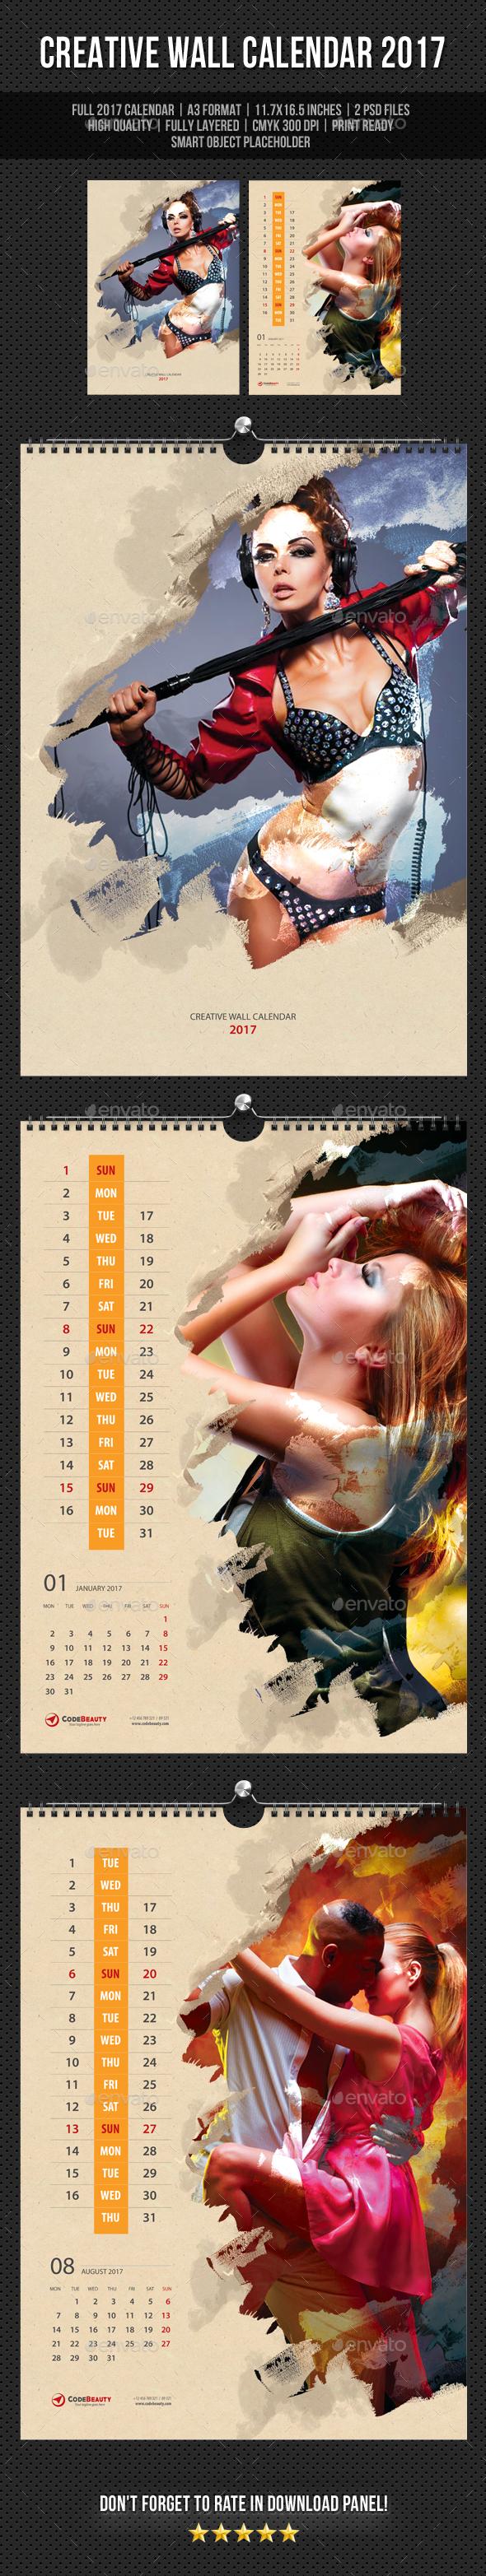 Creative Wall Calendar 2017 Template Psd Design